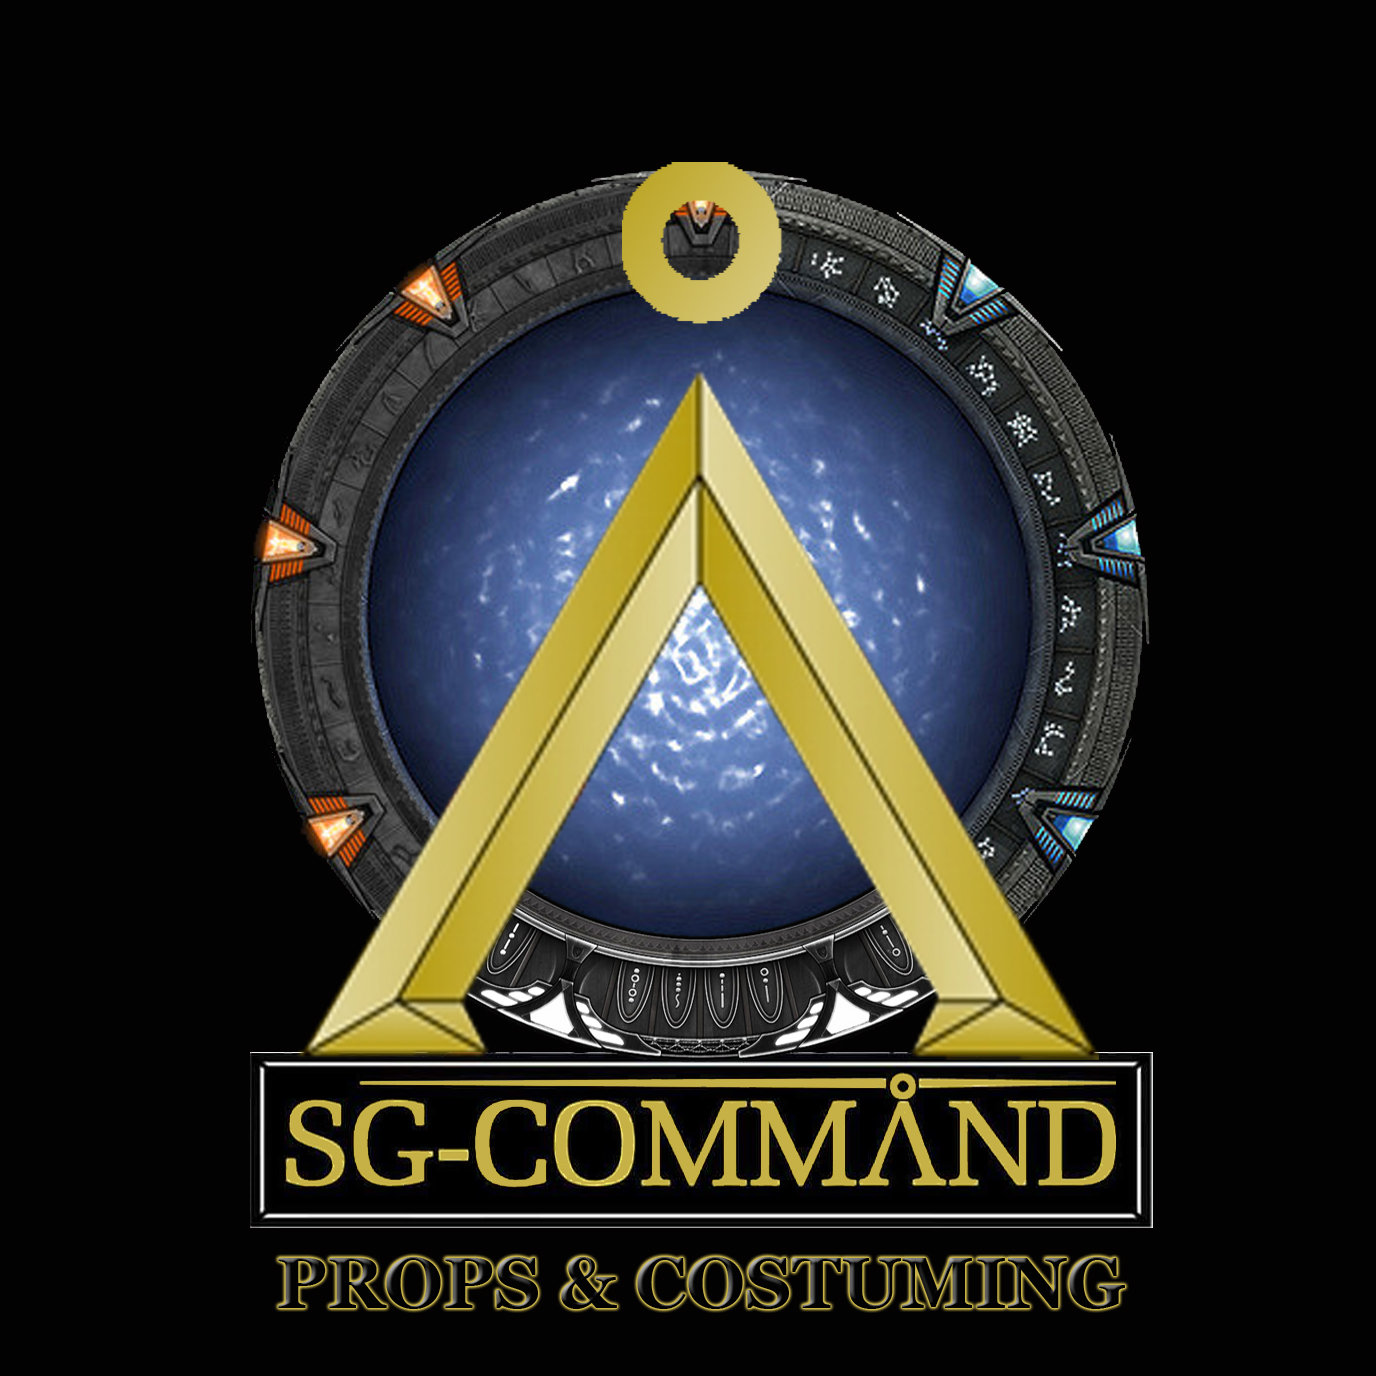 sg-command.org